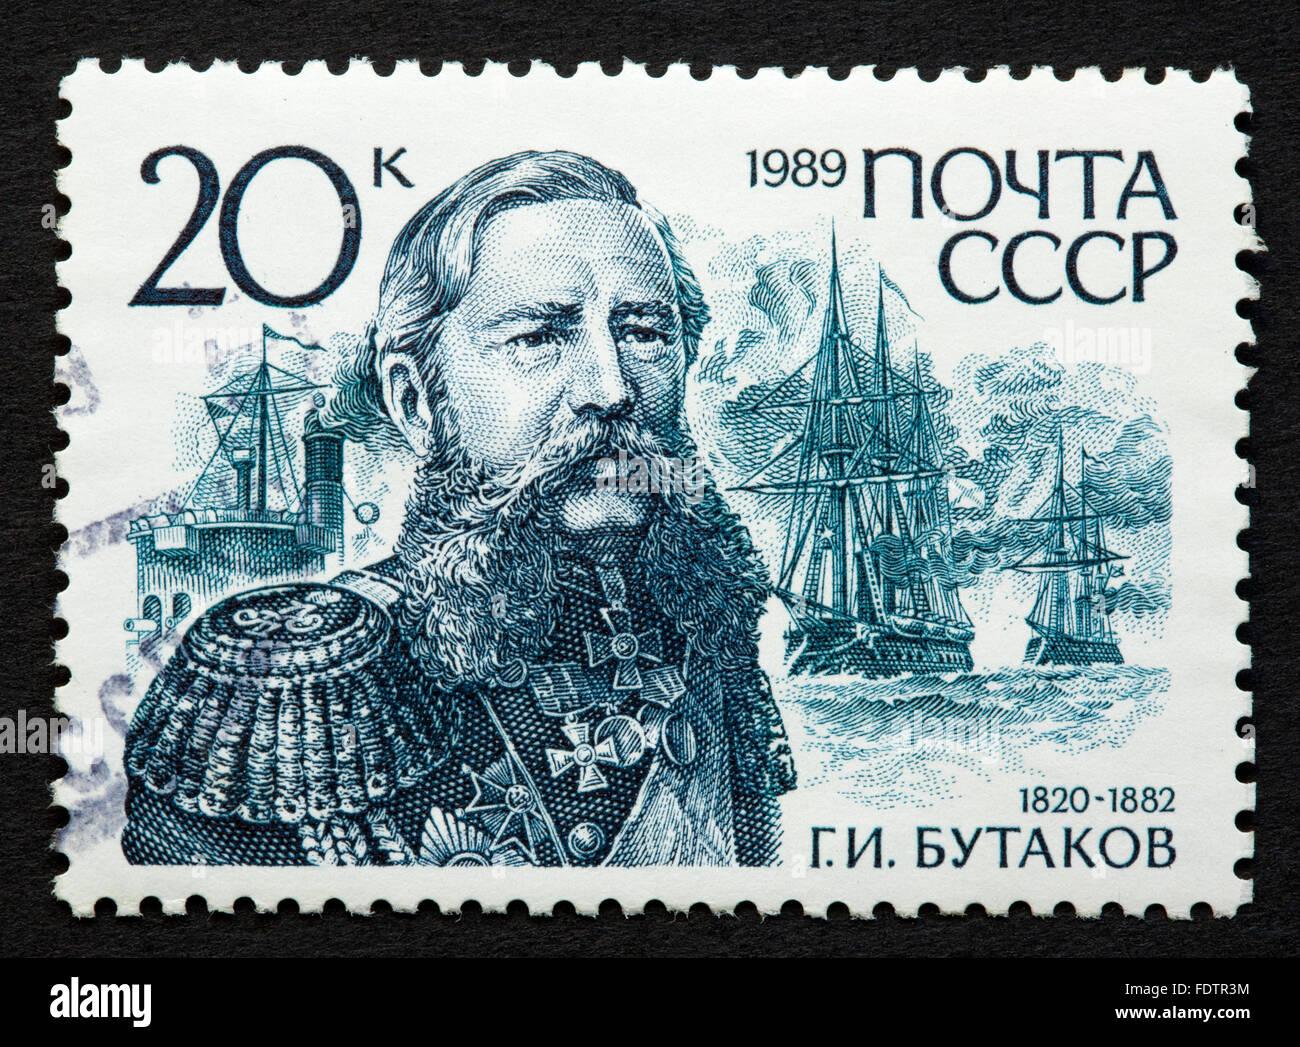 Soviet postage stamp - Stock Image